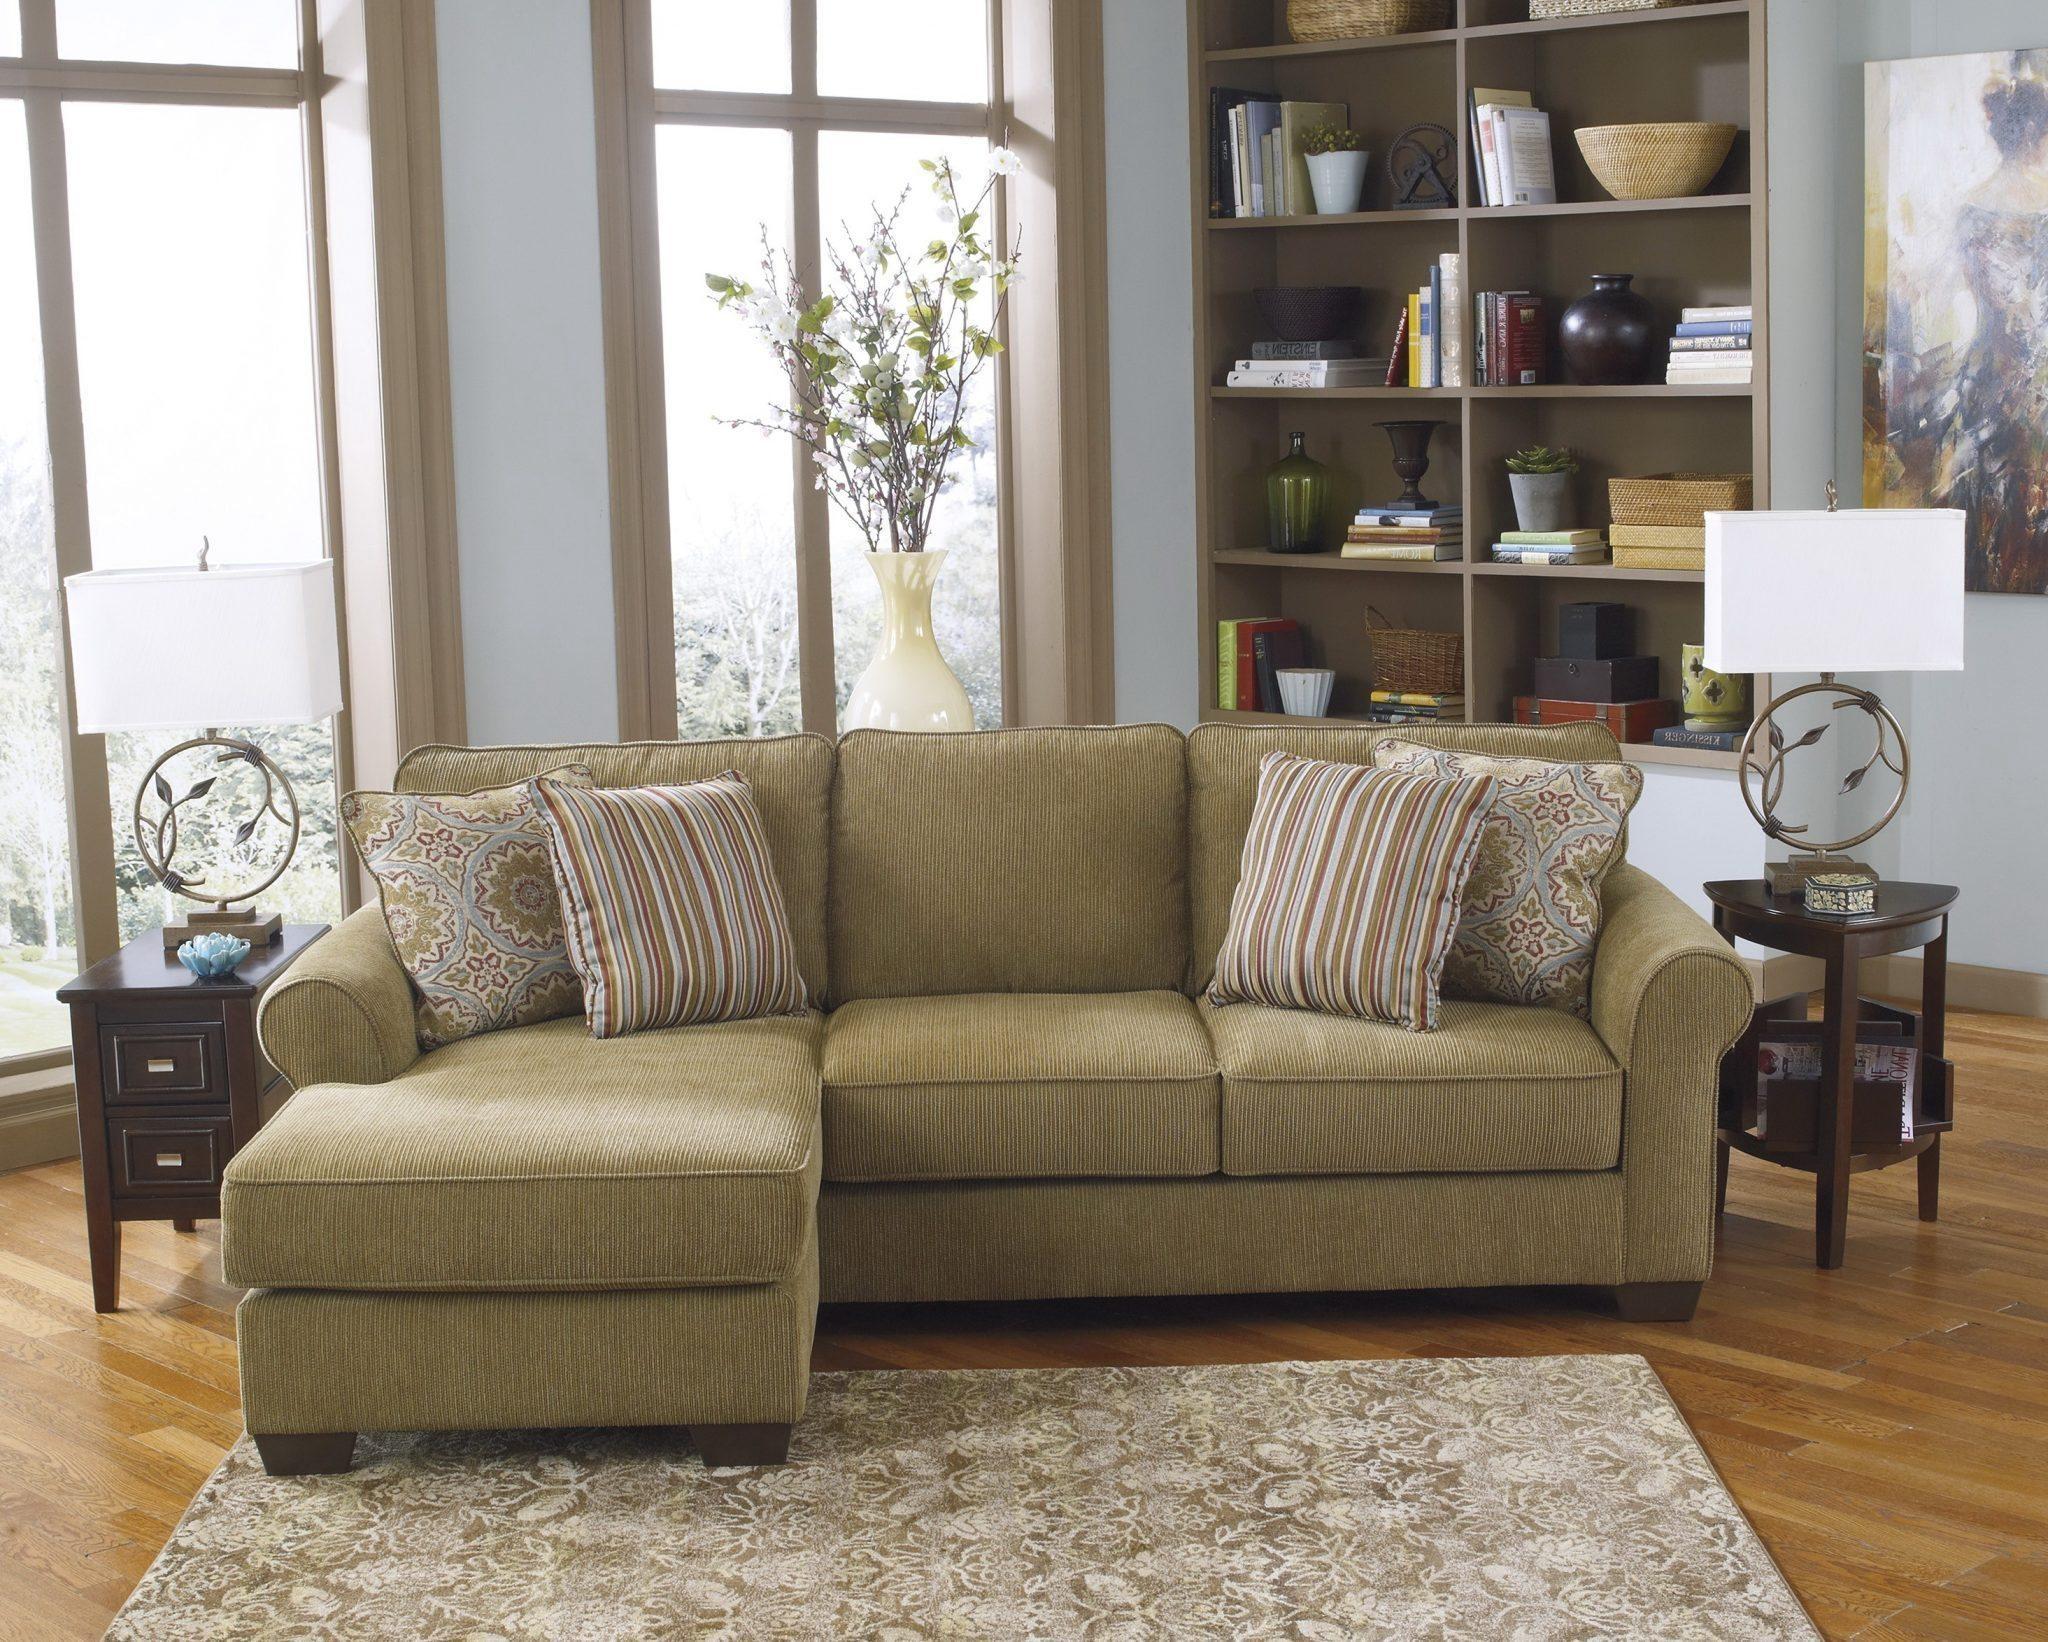 Berkline Sectional Sofa | Sofa Gallery | Kengire Regarding Berkline Sectional Sofas (View 7 of 20)